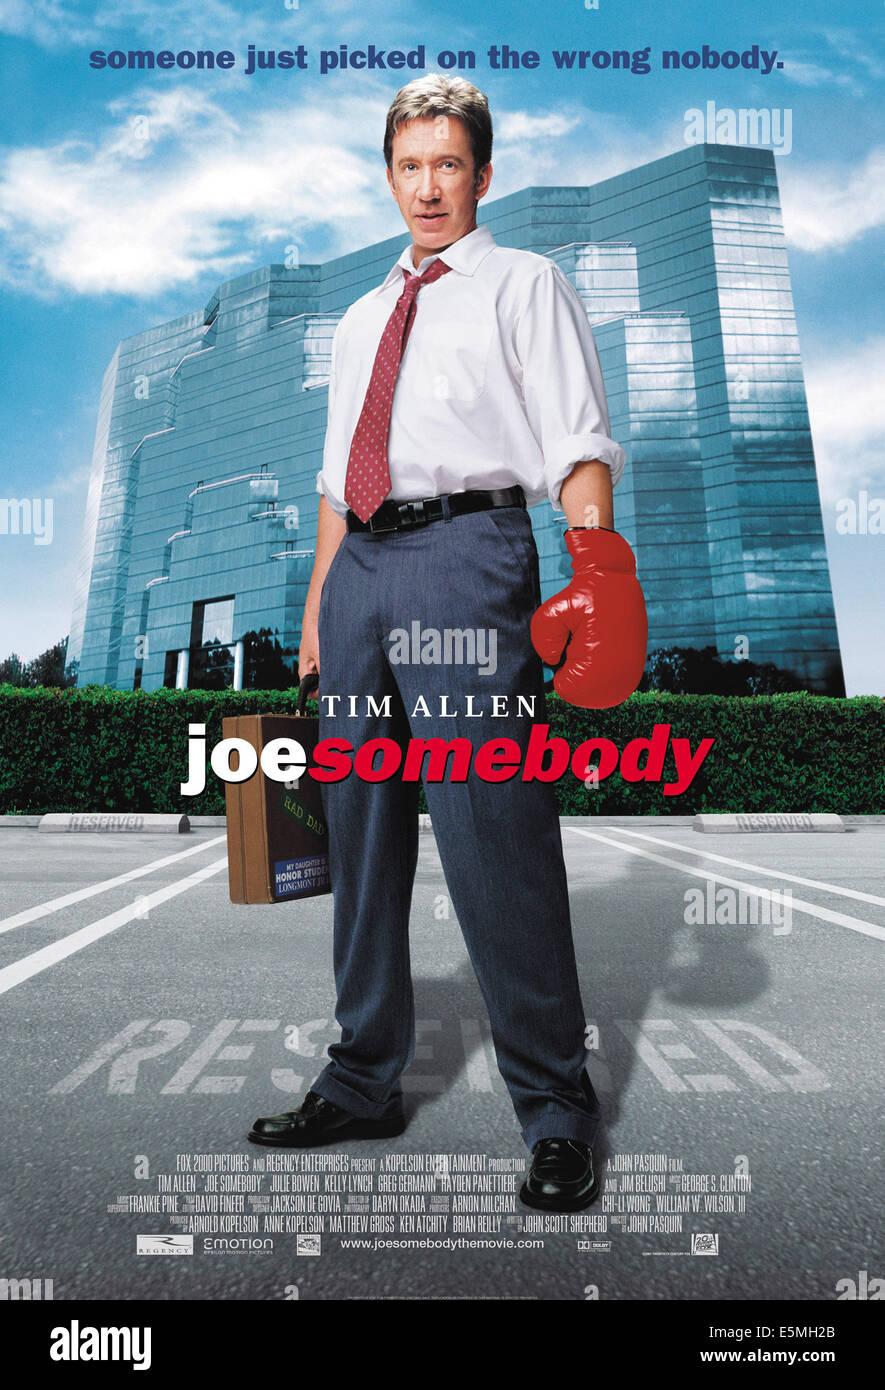 JOE SOMEBODY, Tim Allen, 2001, TM & Copyright (c) 20th Century Fox Film Corp. All rights reserved. - Stock Image